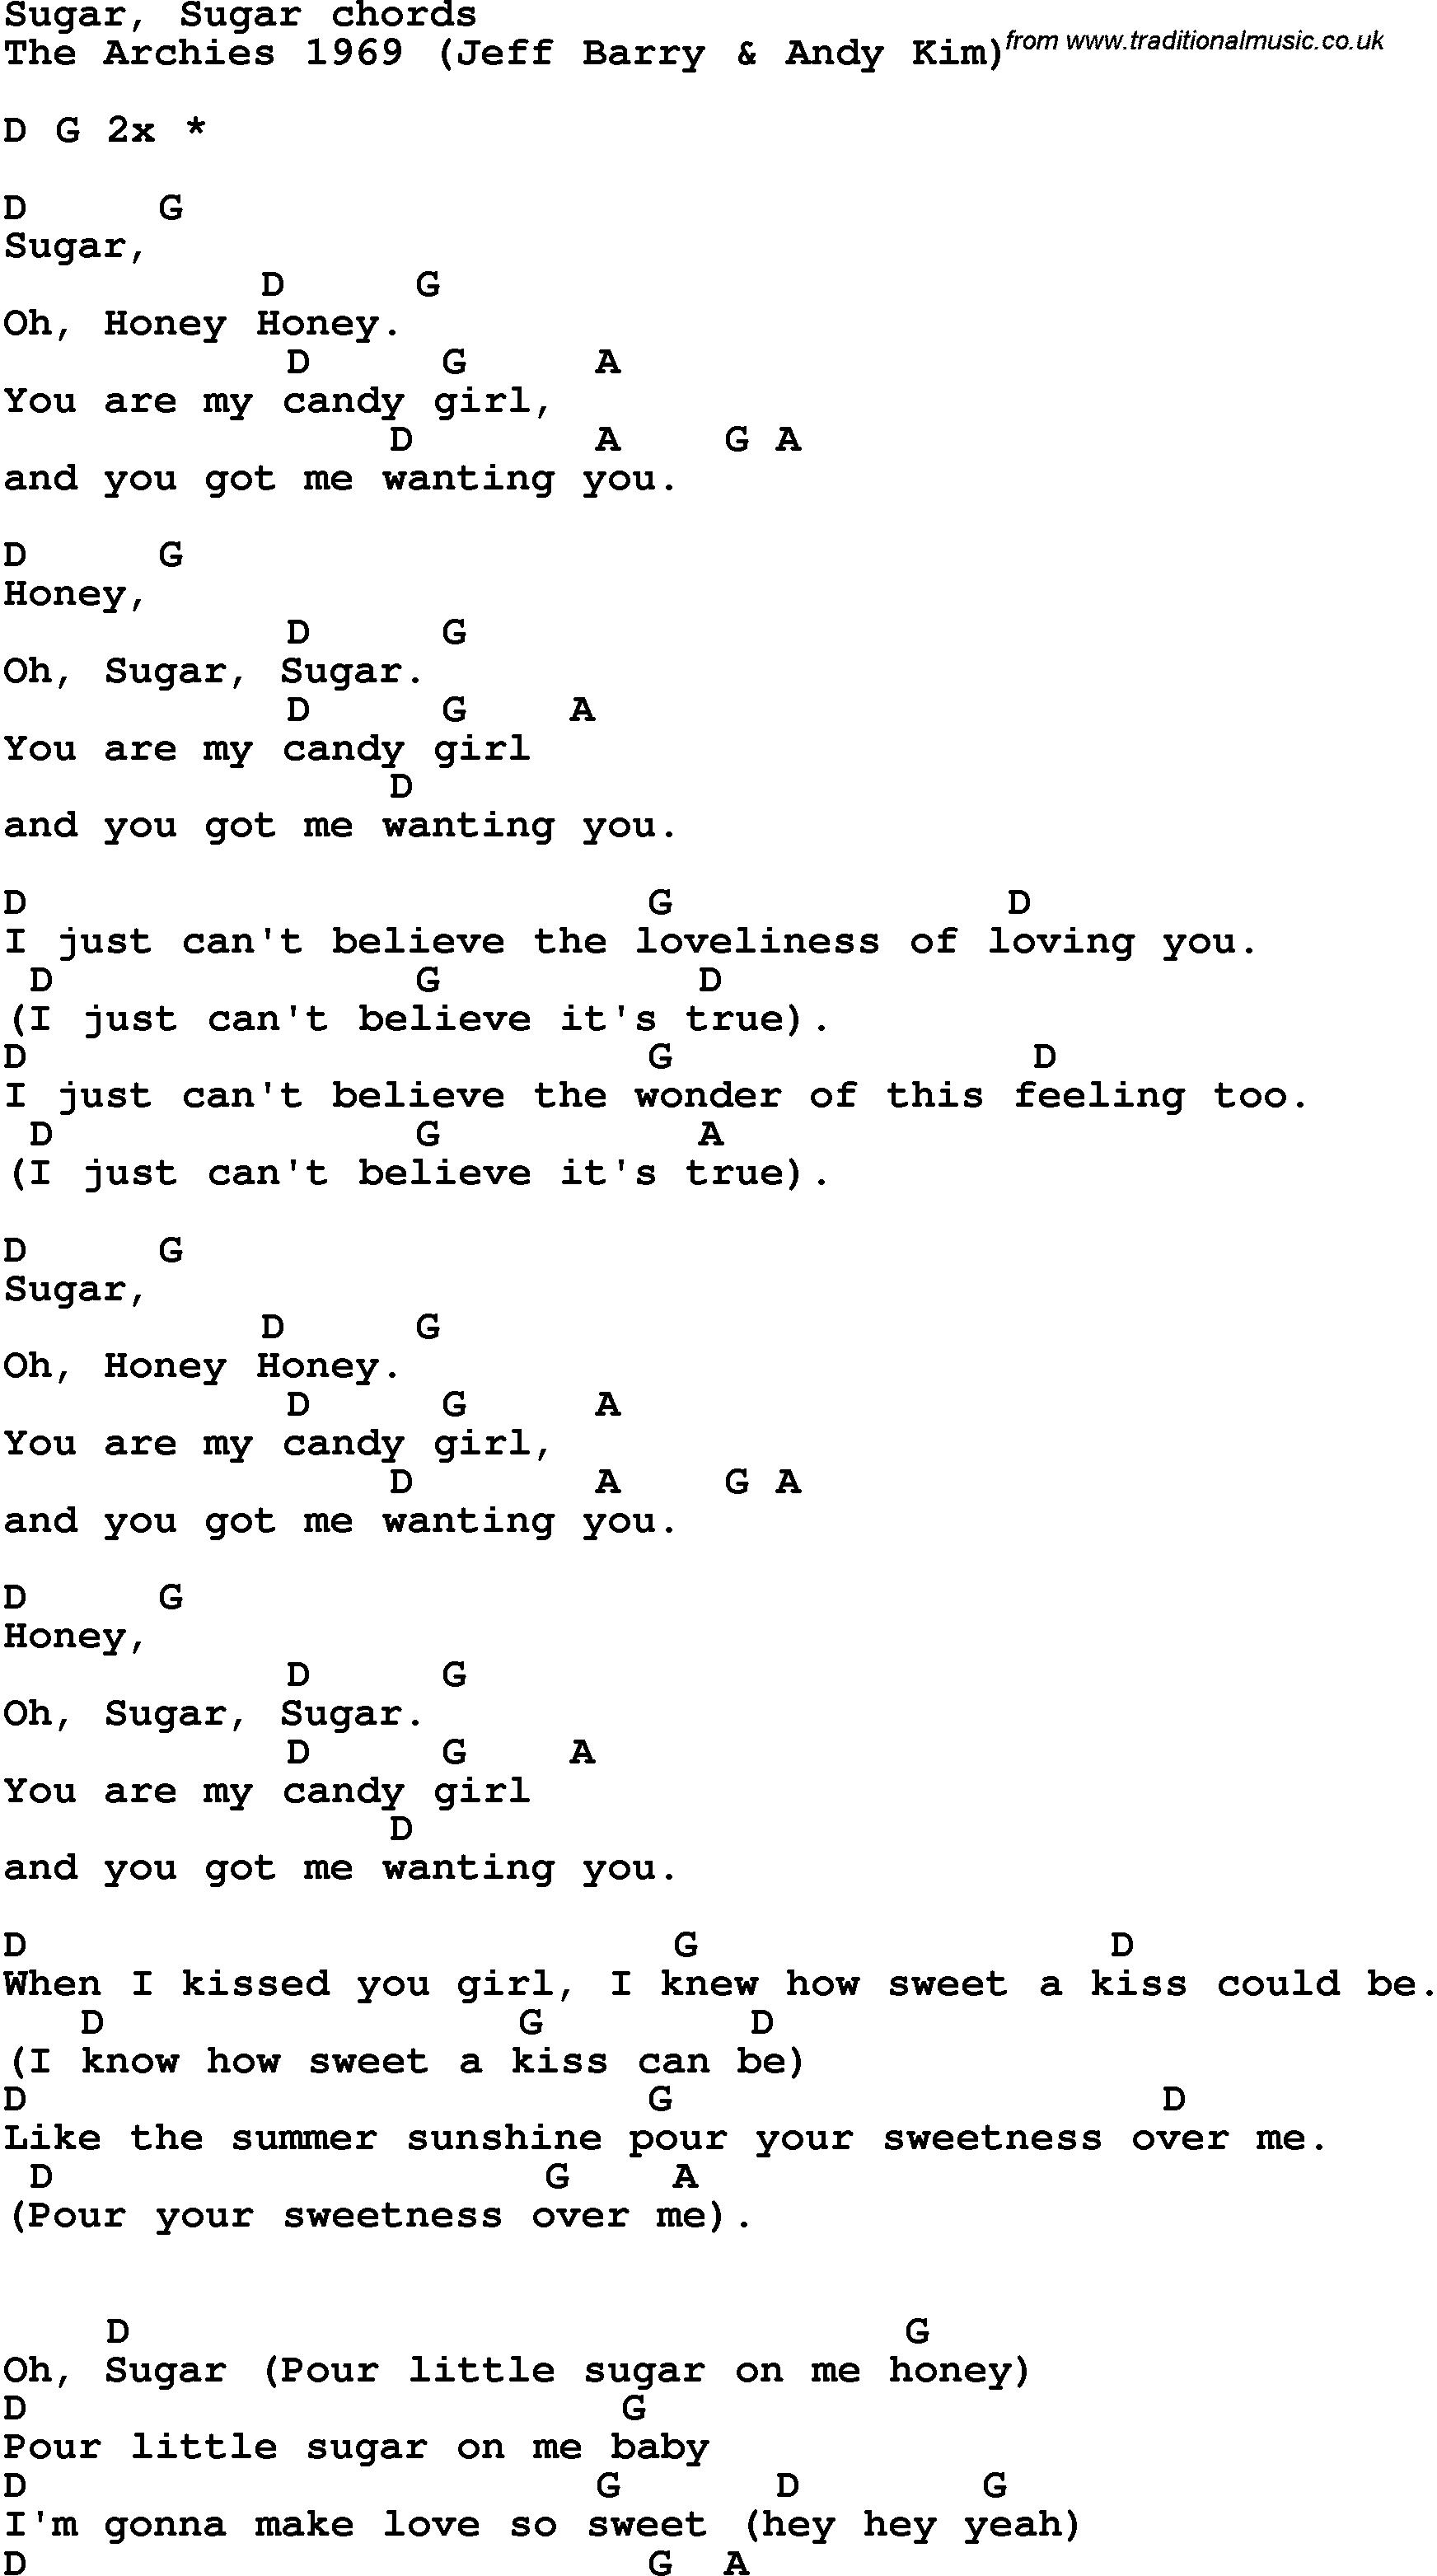 Song Lyrics With Guitar Chords For Sugar, Sugar | Guitar Art In 2019 - Free Printable Song Lyrics With Guitar Chords